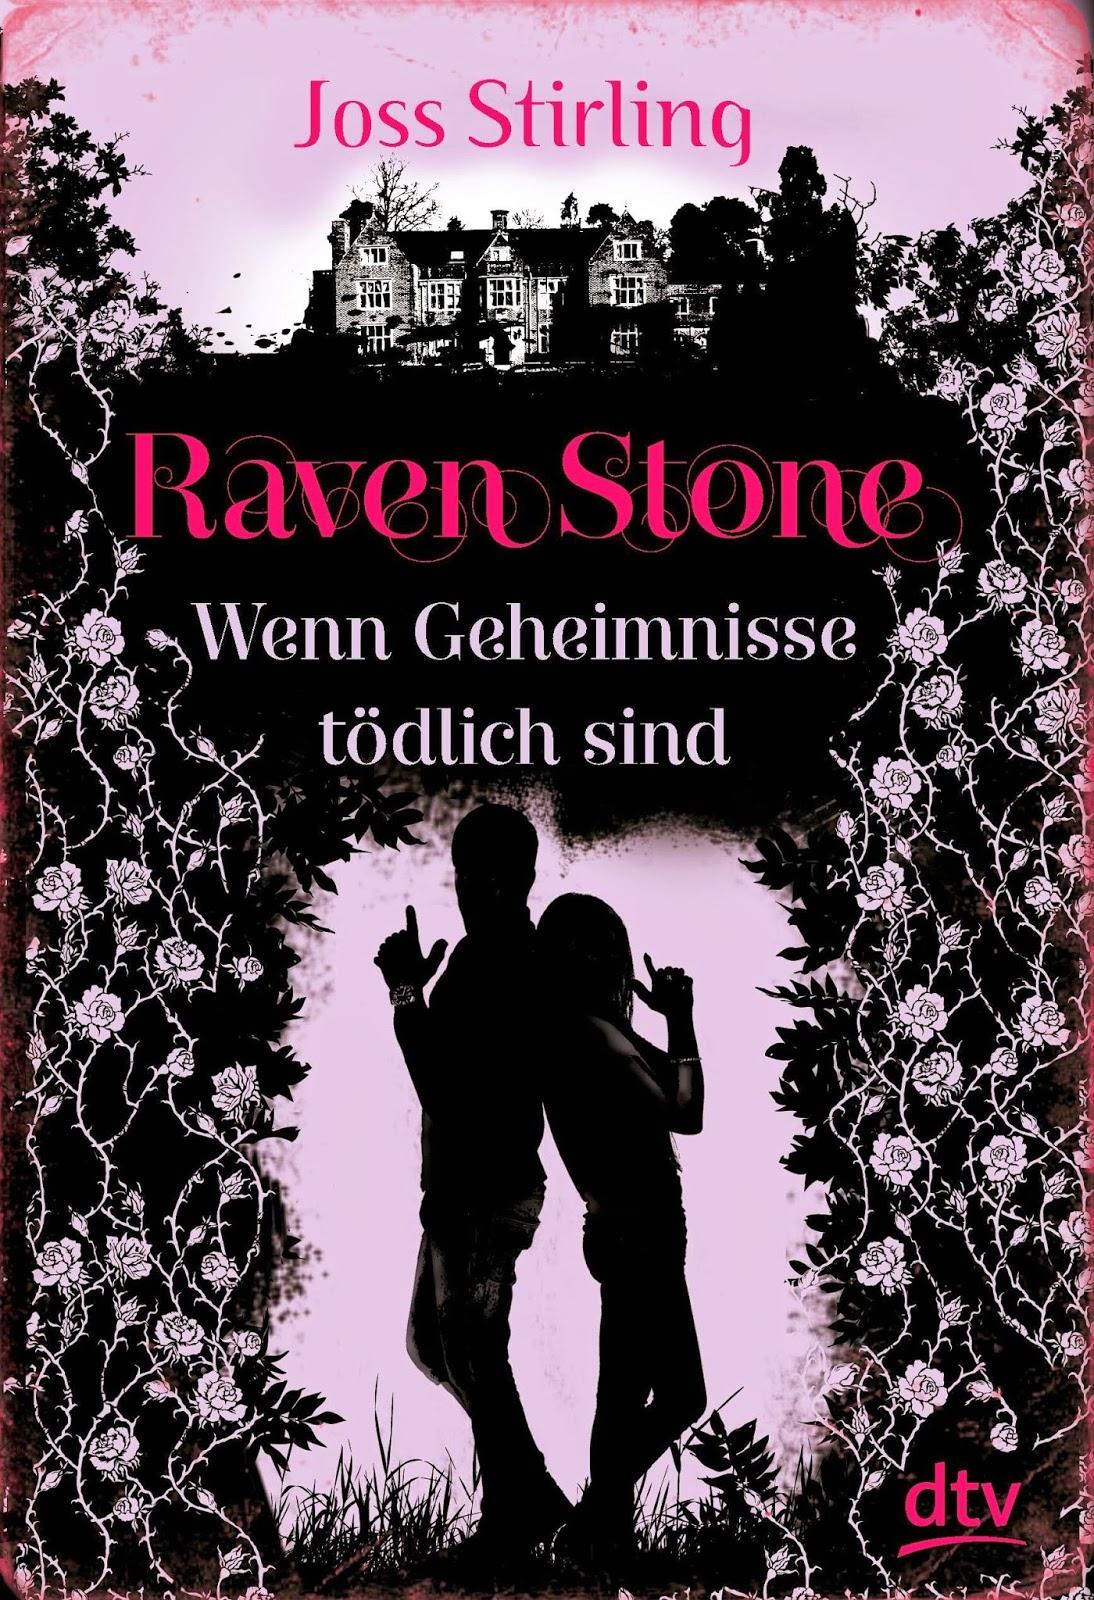 http://www.dtv-dasjungebuch.de/buecher/raven_stone_-_wenn_geheimnisse_toedlich_sind_76097.html